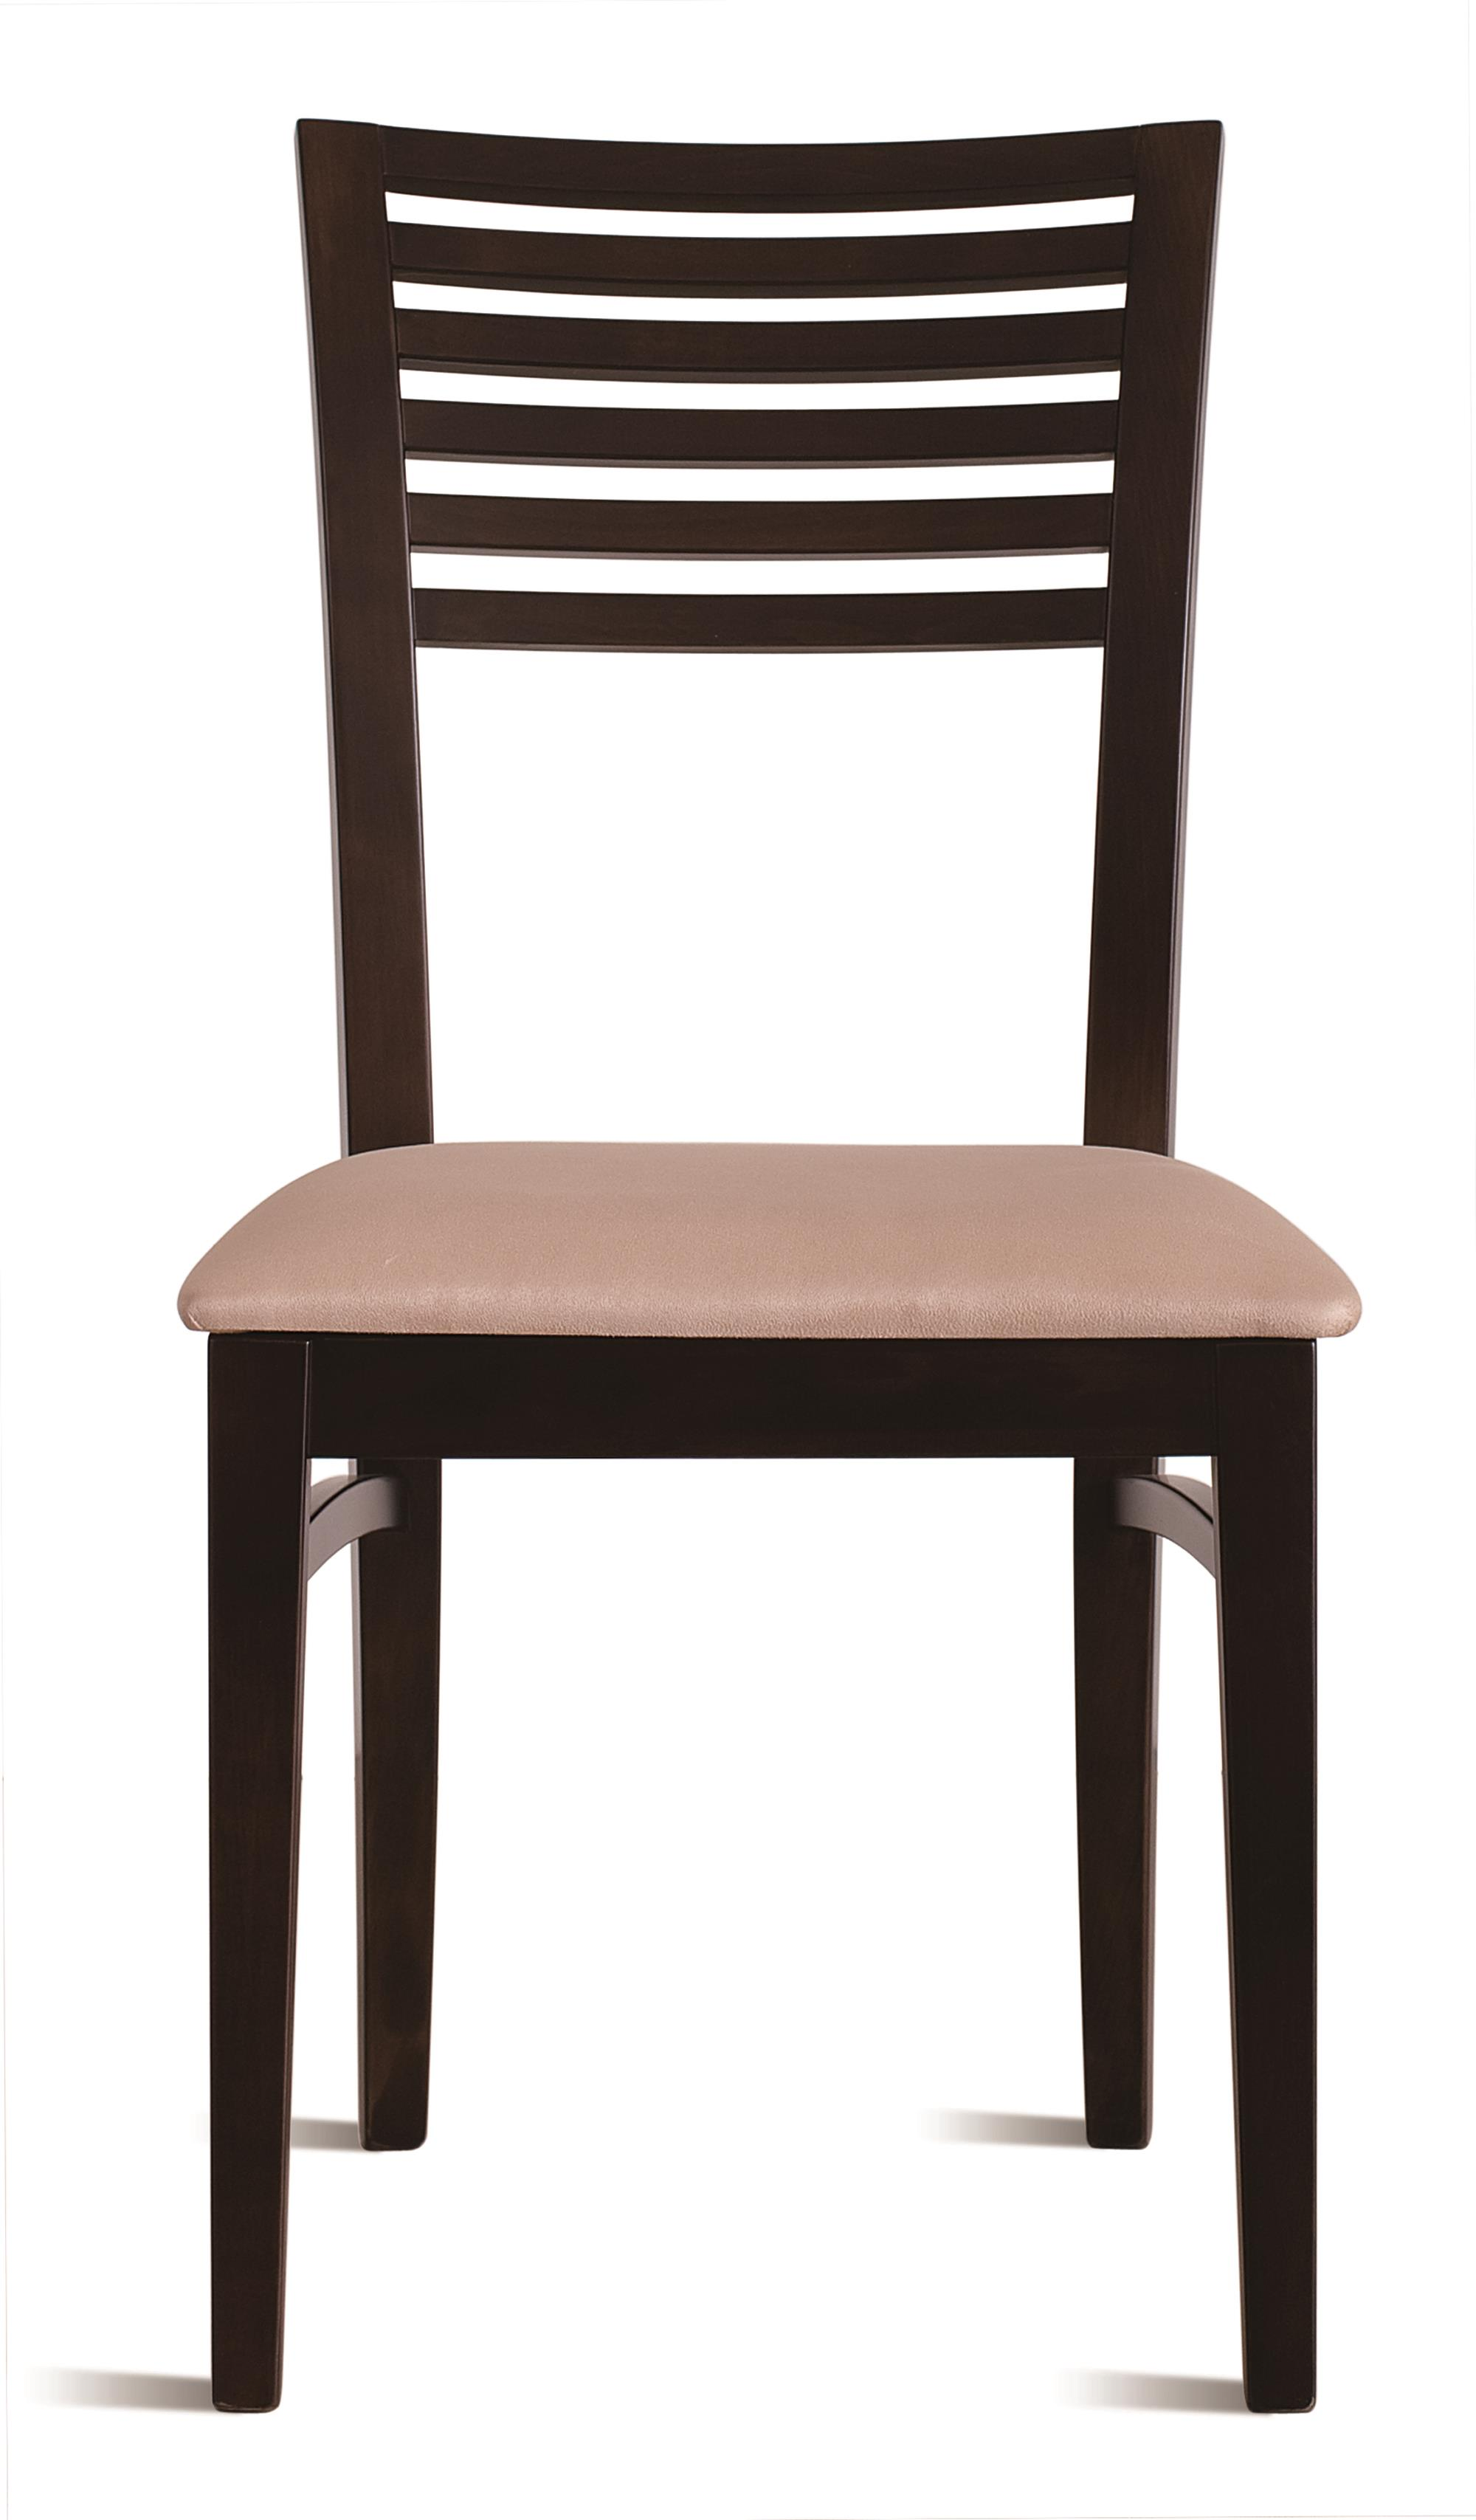 Kinwai USA Tango Dining Side Chair - Item Number: 22008-511-ITC23